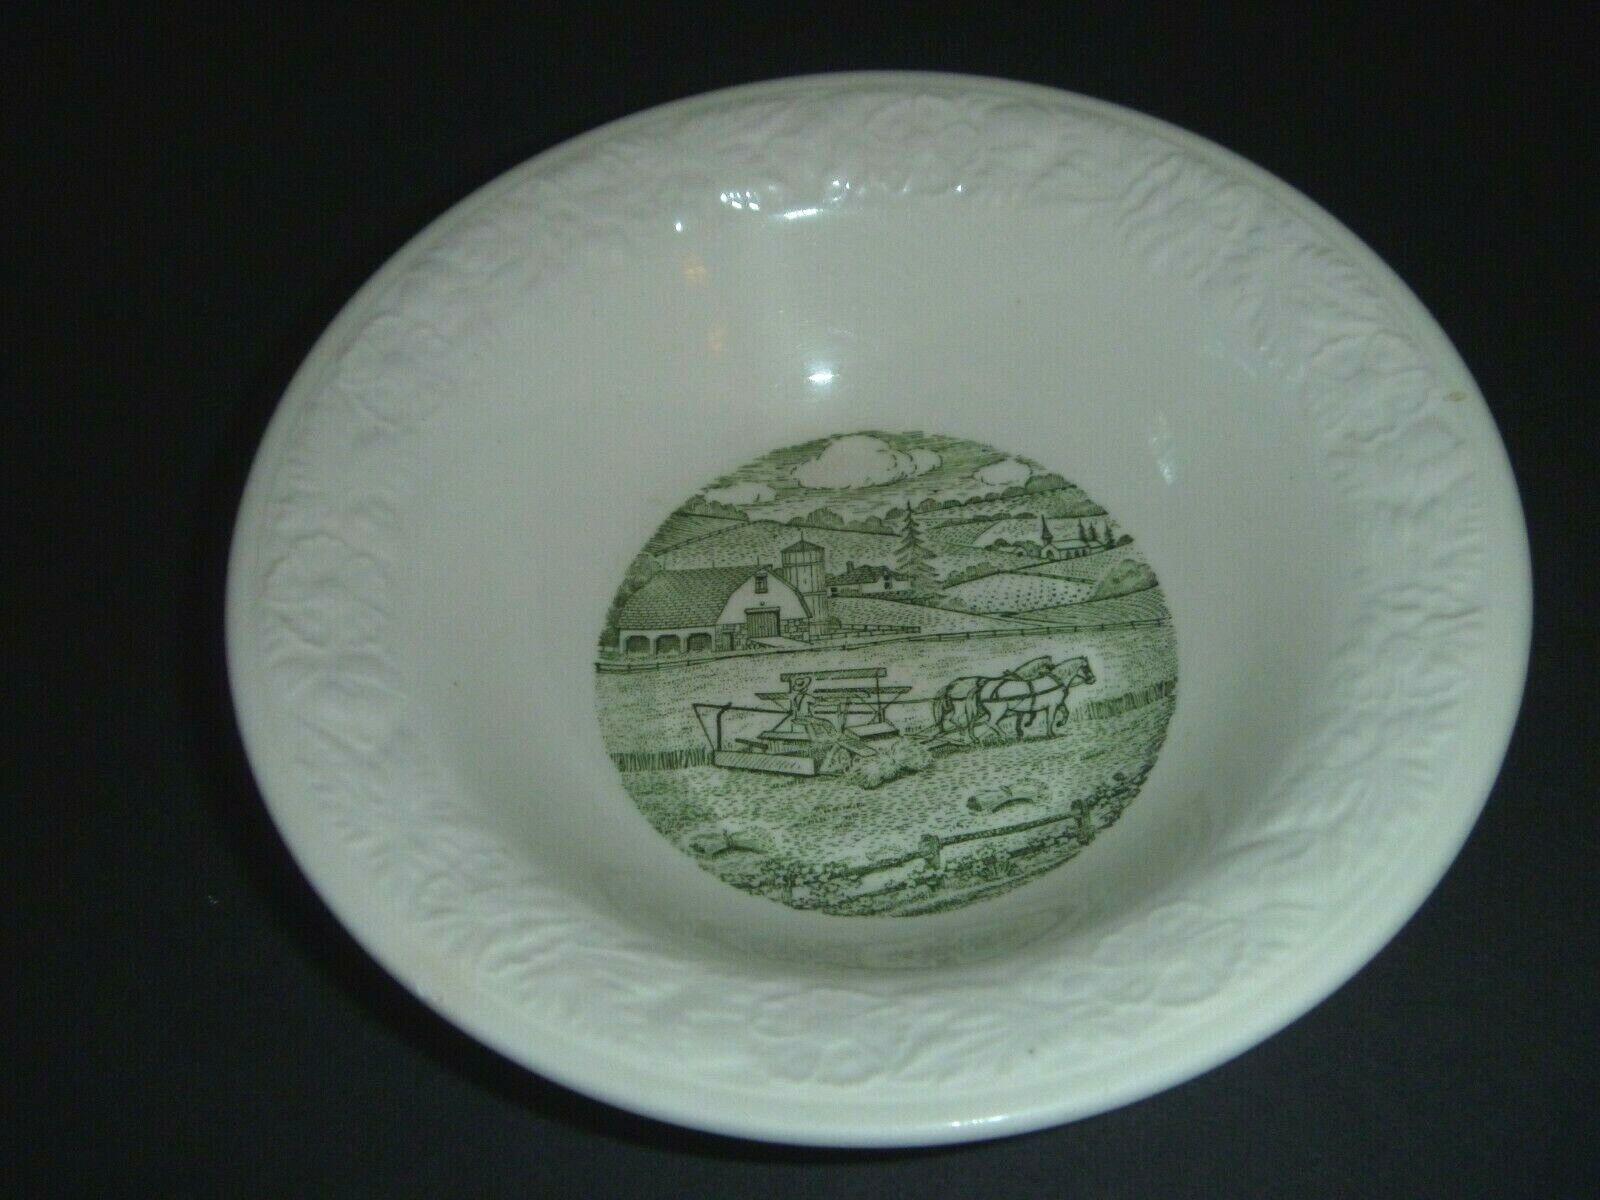 VINTAGE - TAYLOR, SMITH TAYLOR - PASTORAL - FARM HARVEST EMBOSSED GREEN BOWL - $1.99